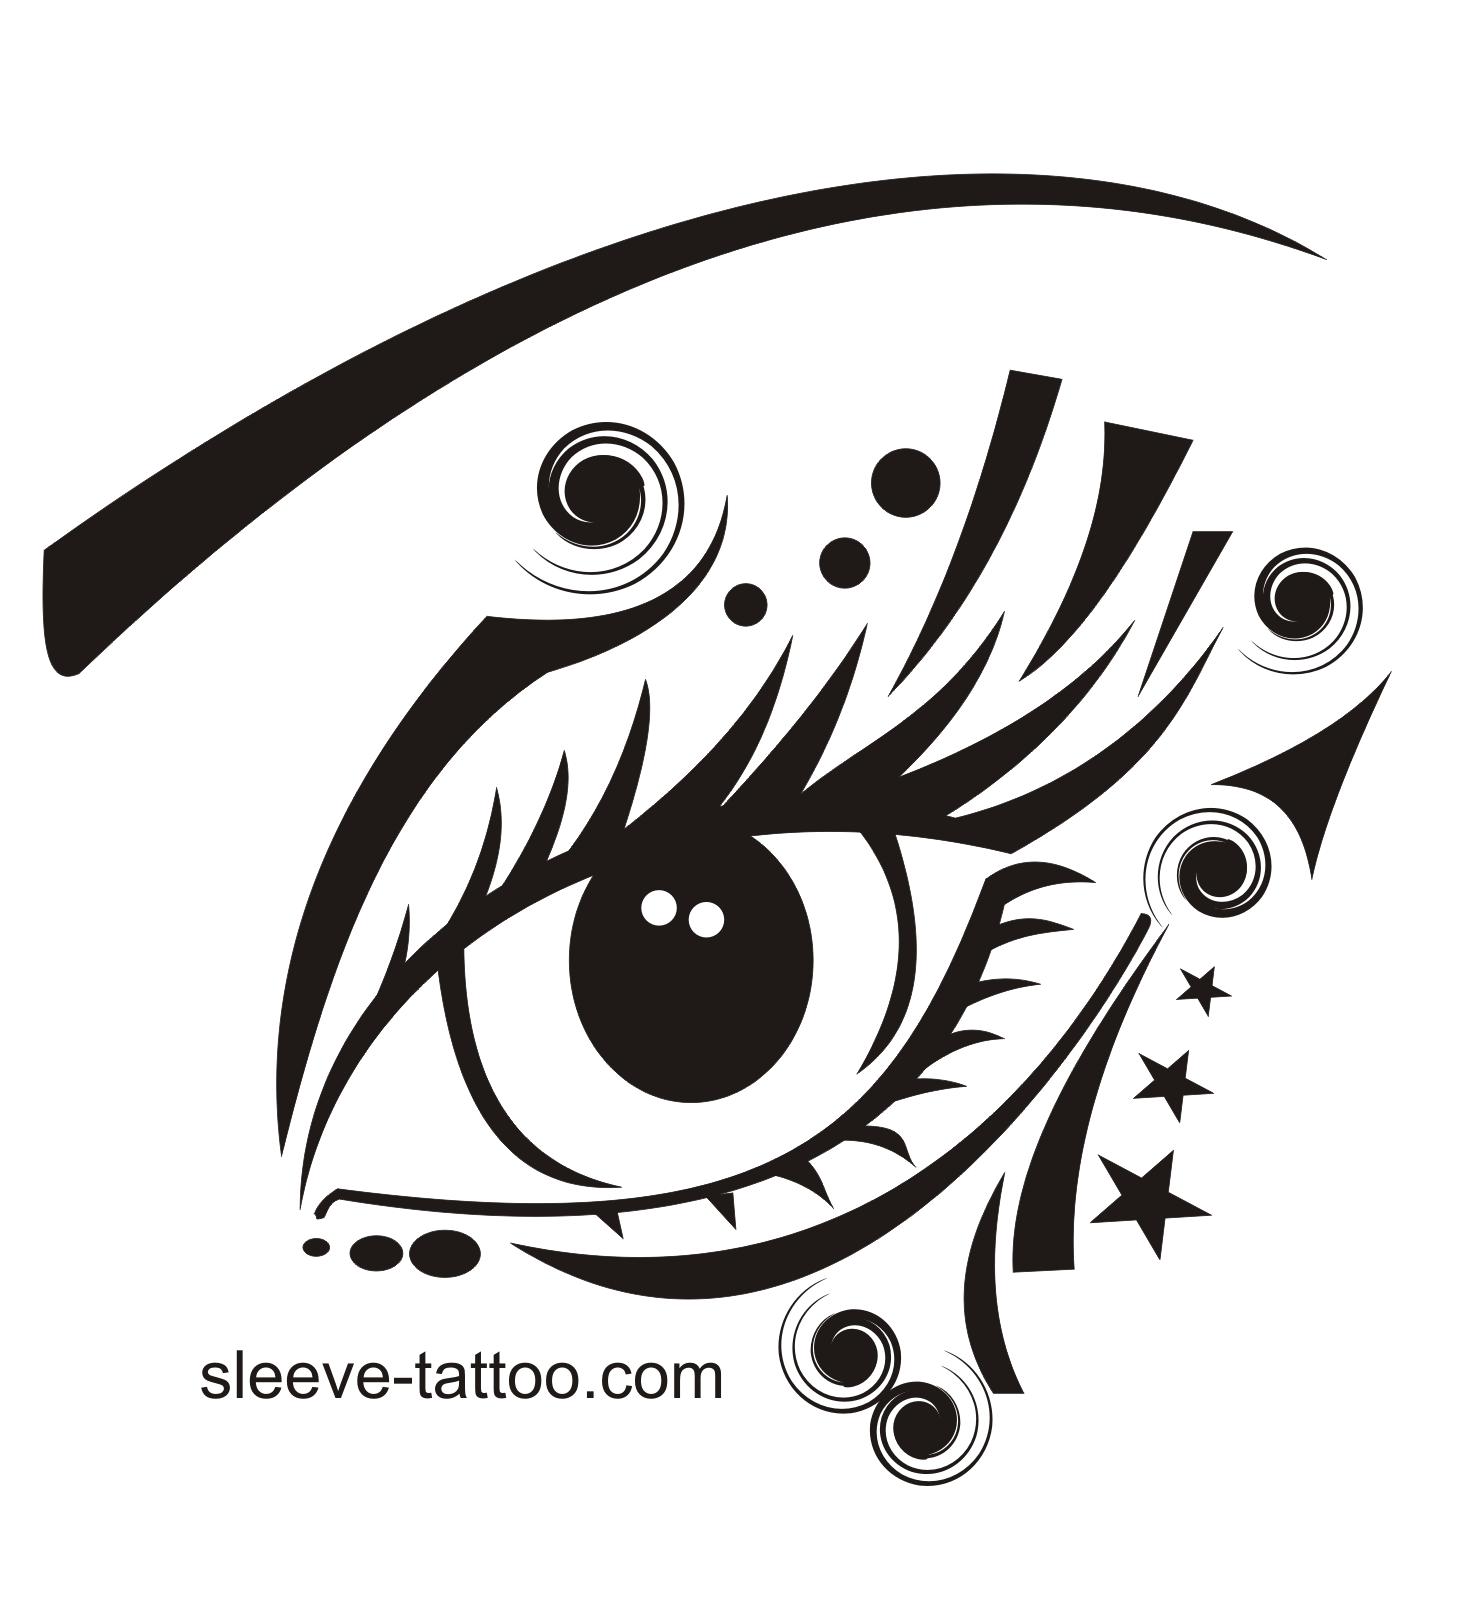 Simple skull tattoo designs - Awesome Tribal Tattoo History And Symbolism Cute Tattoo Design Simple Skull